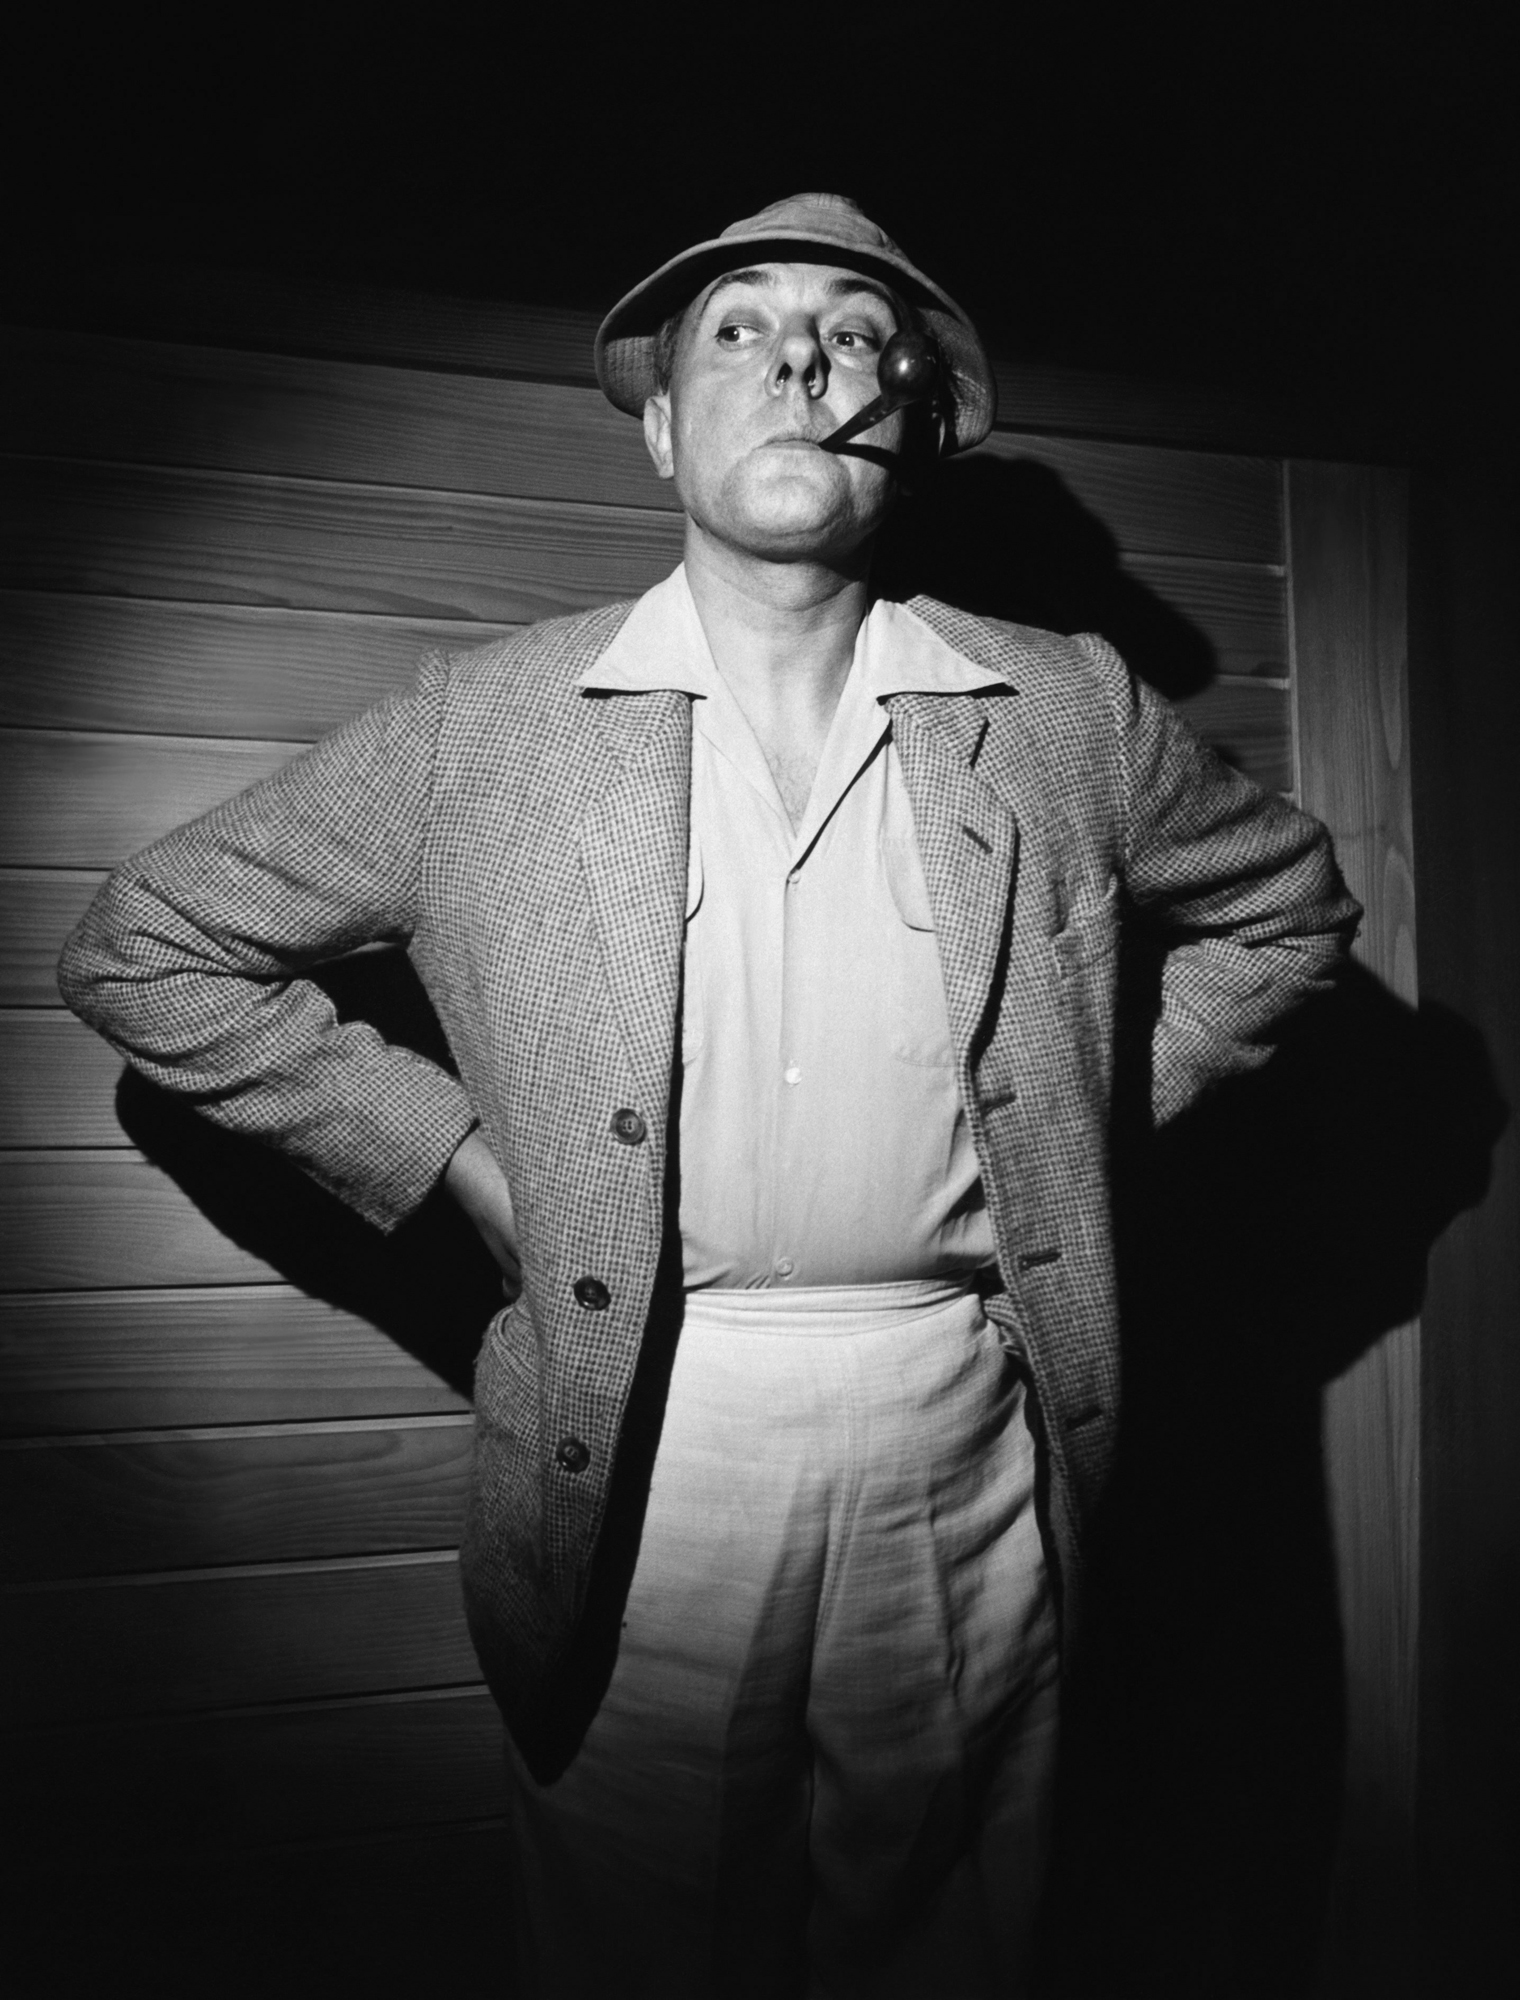 Jacques Tati als Monsieur Hulot.